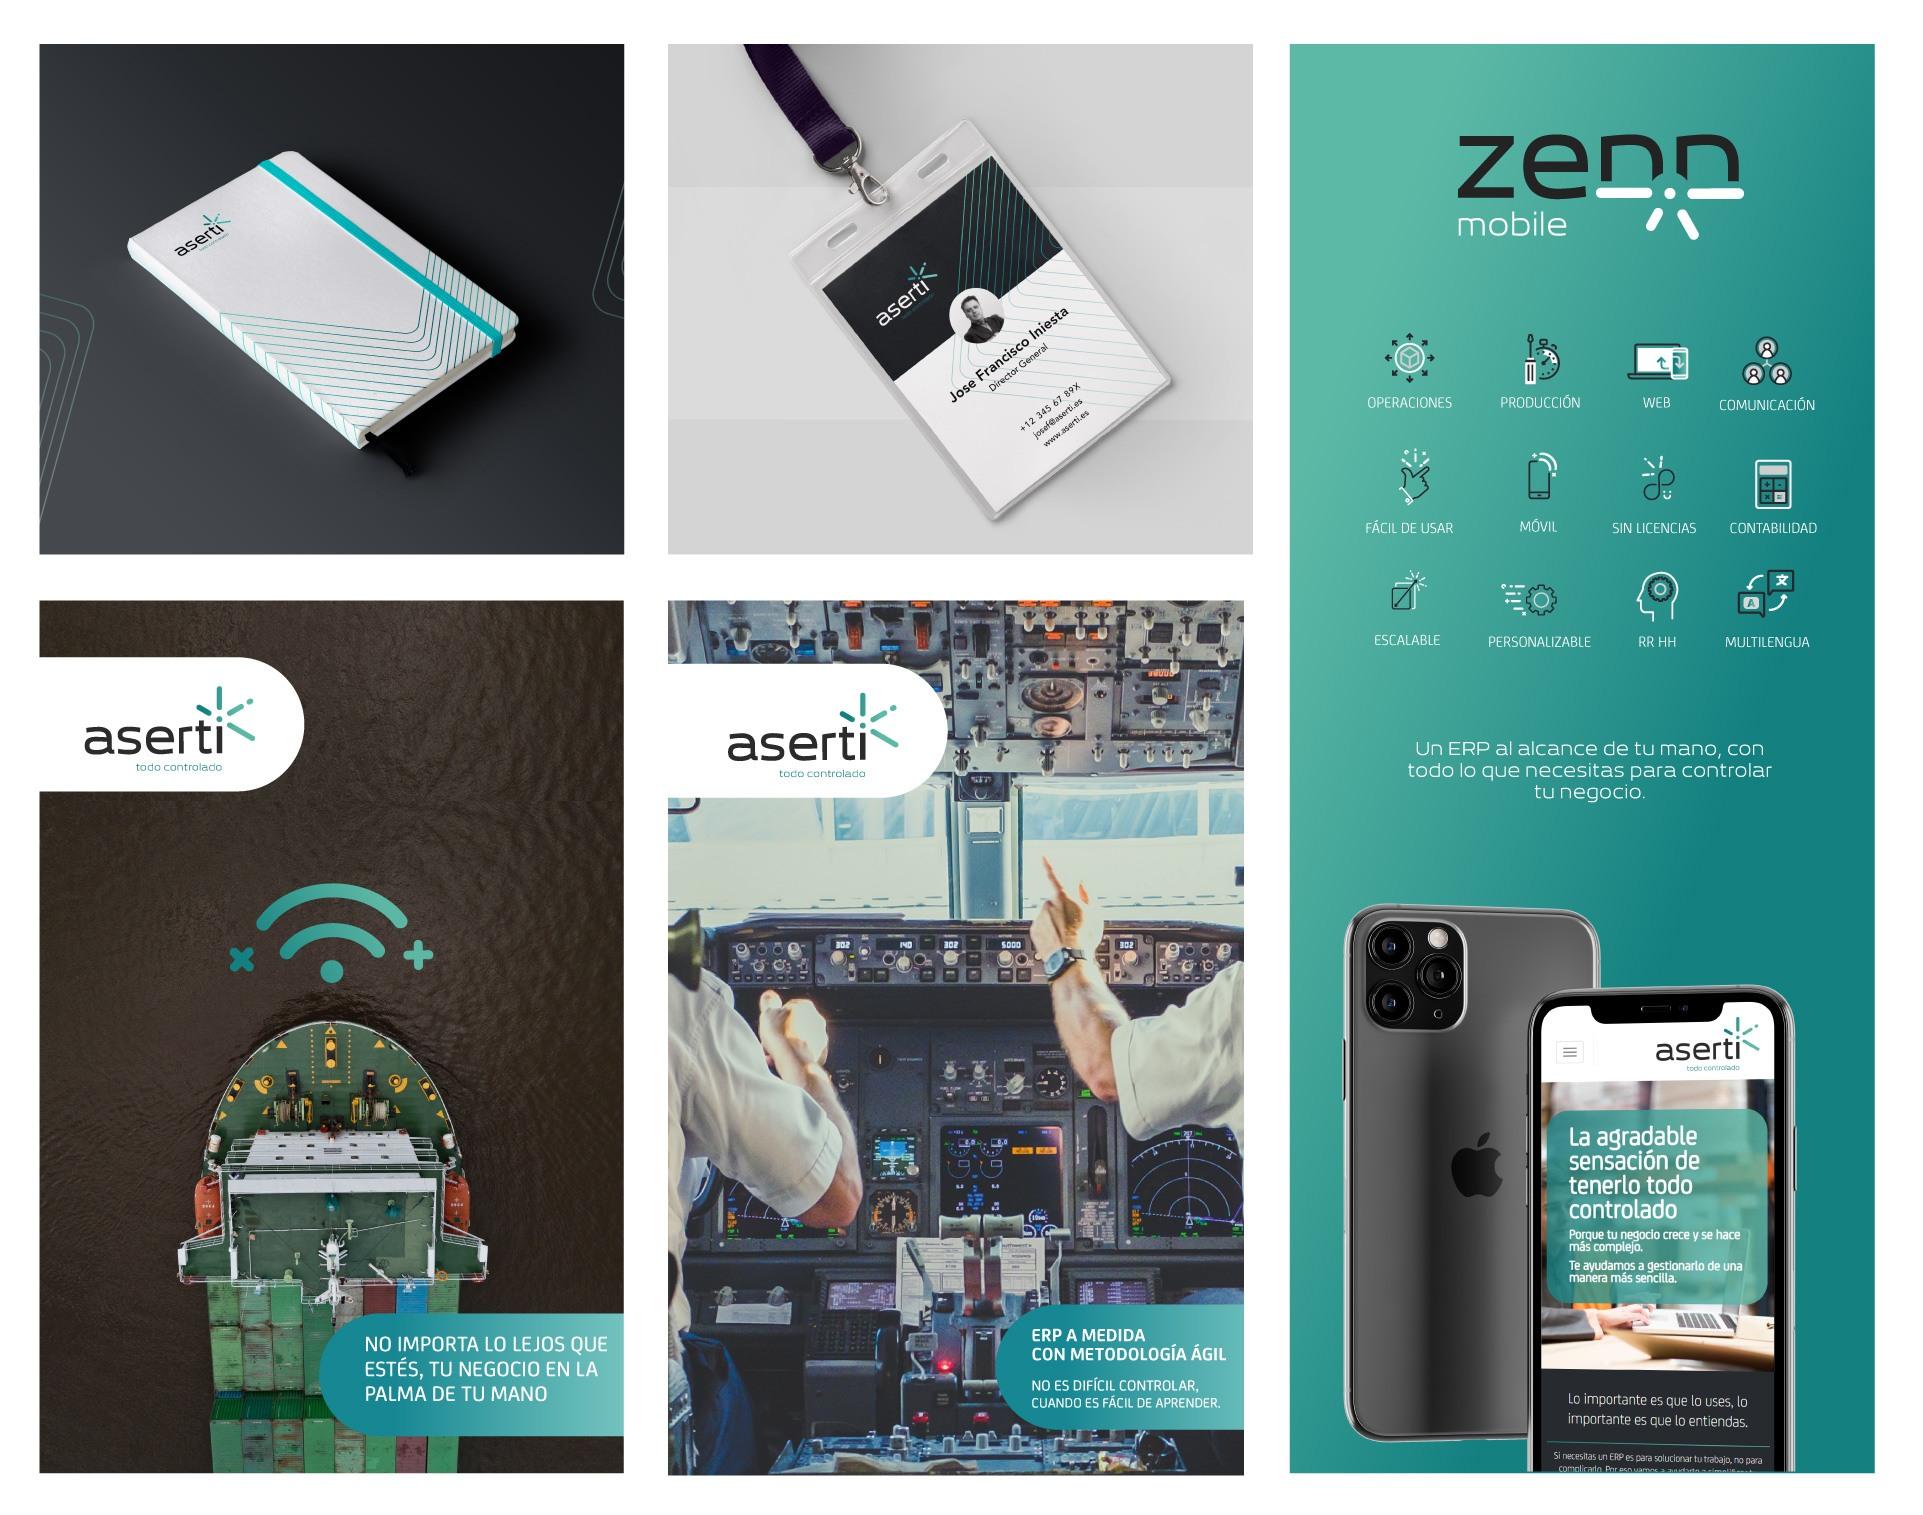 behind identidad marca estrategia diseño Aserti 8